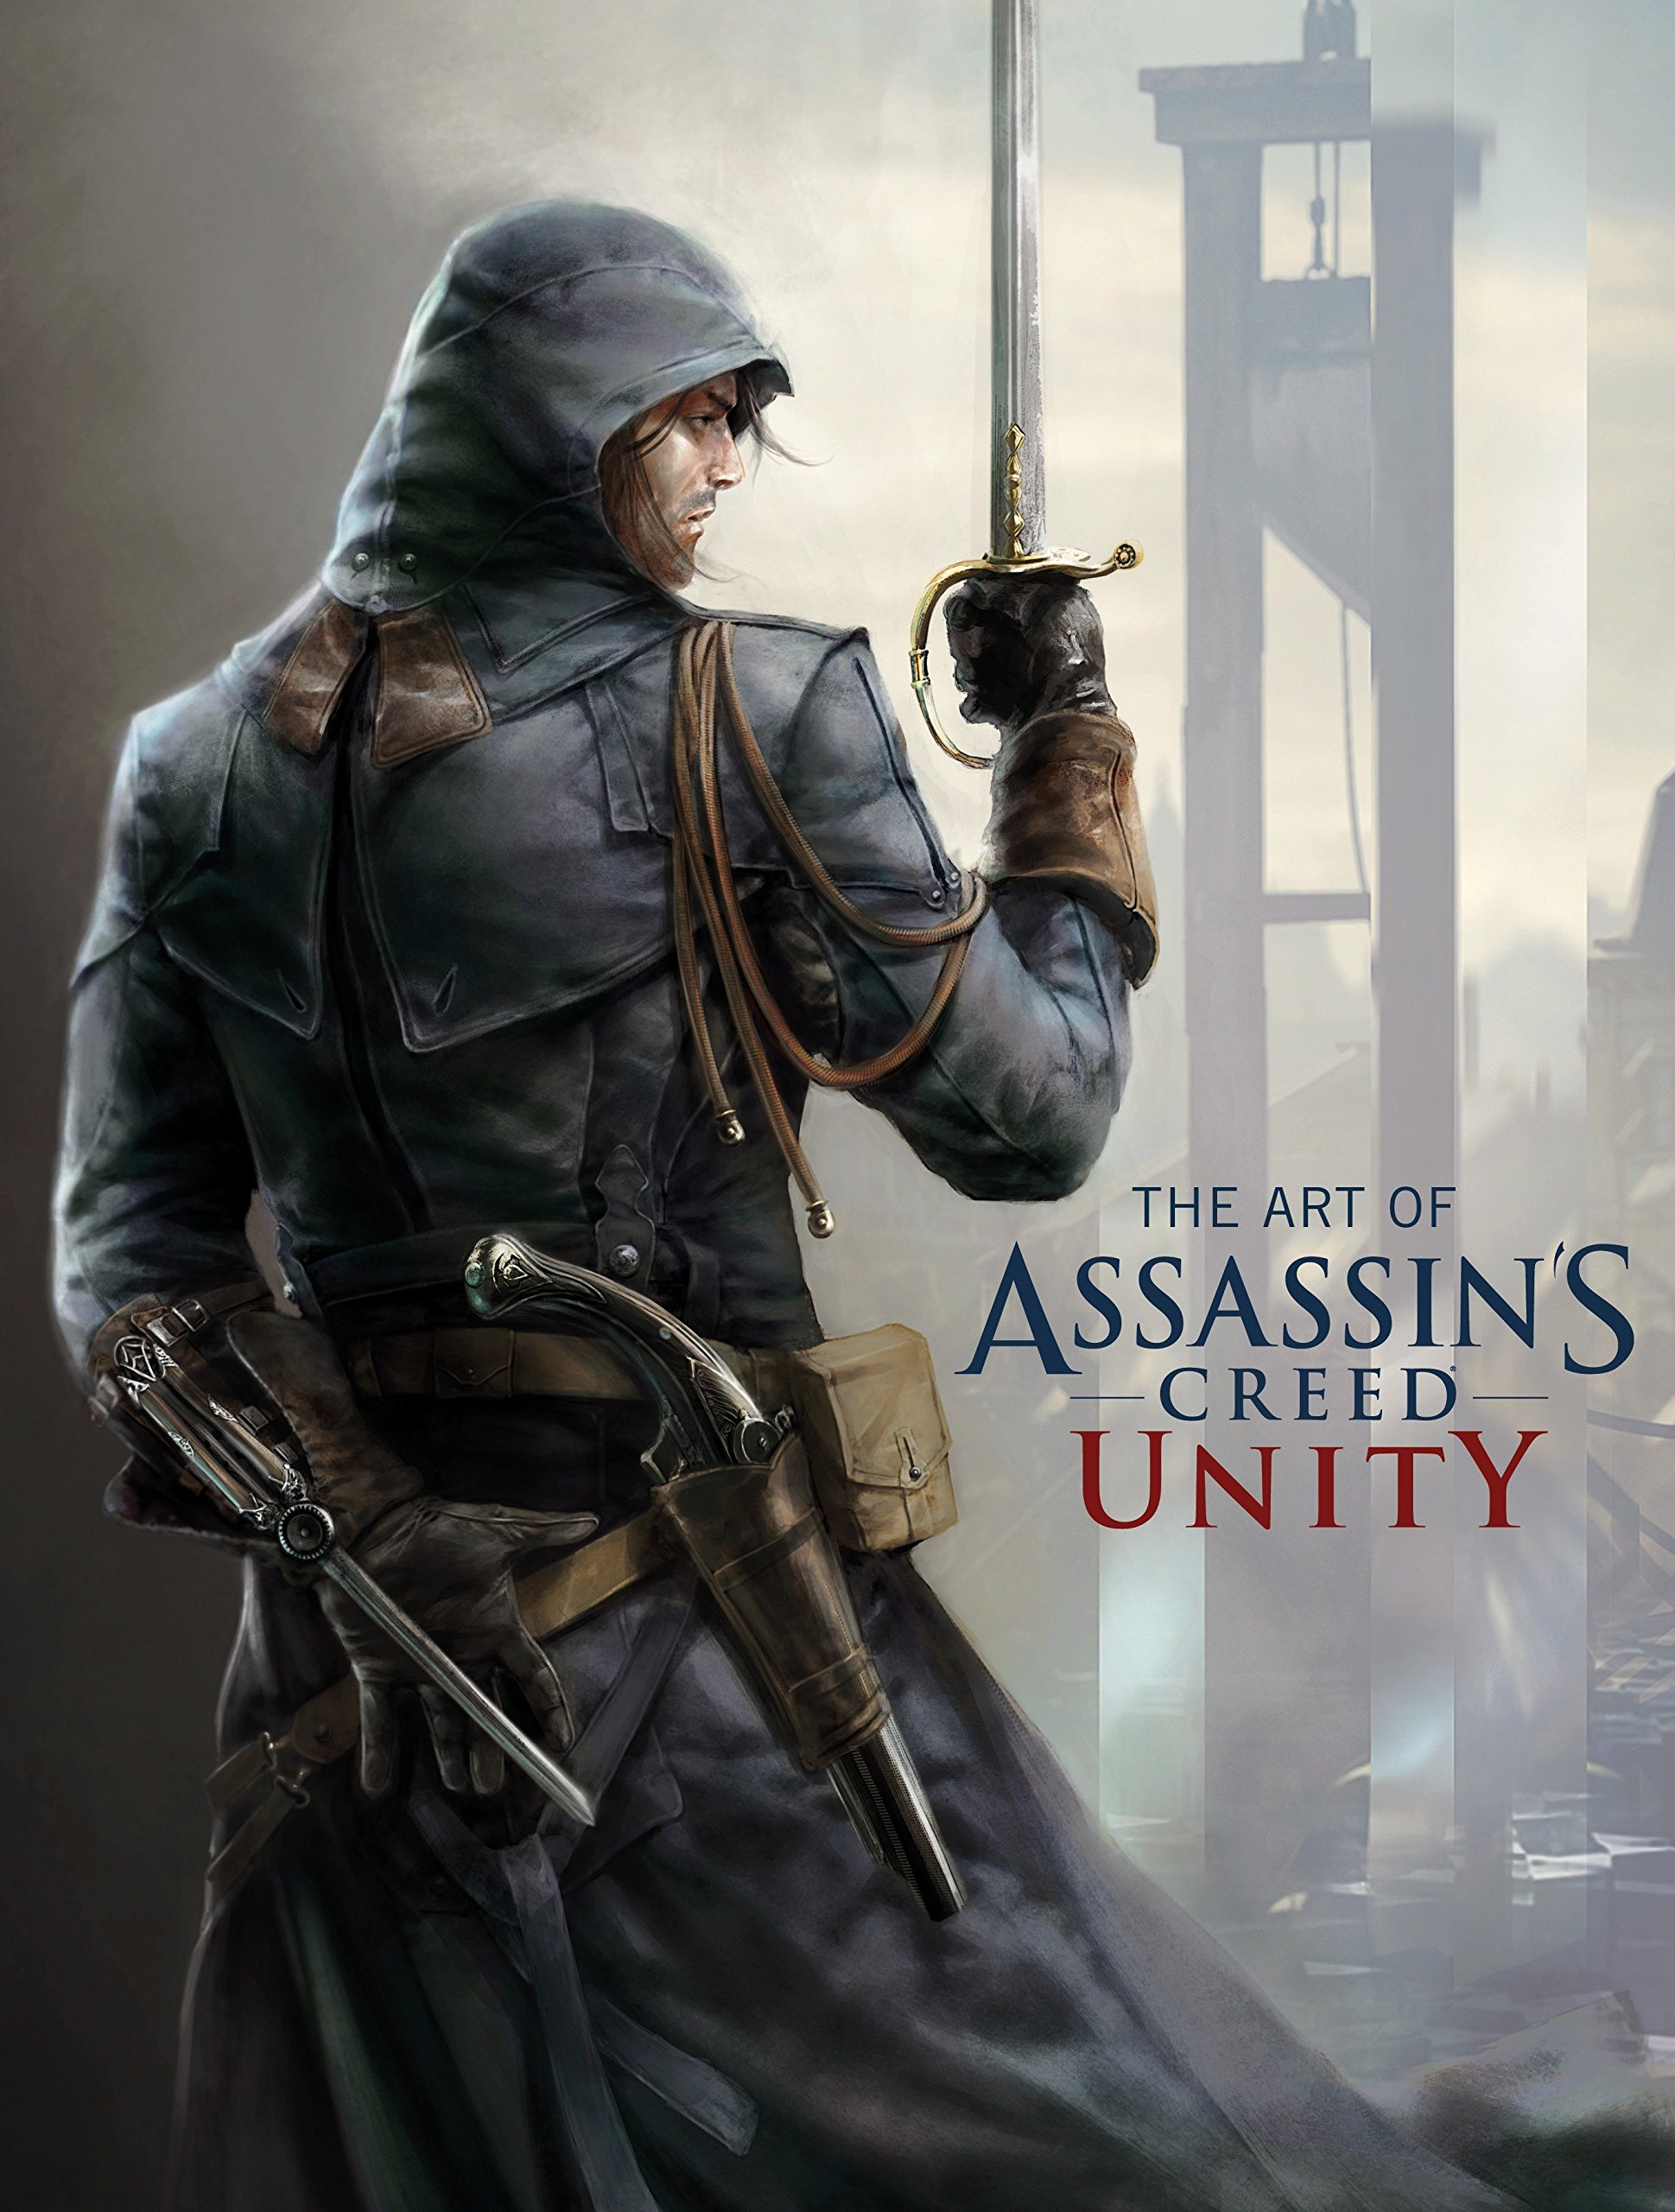 The Art of Assassin's Creed - Unity: Amazon.co.uk: Paul Davies:  9781781166901: Books